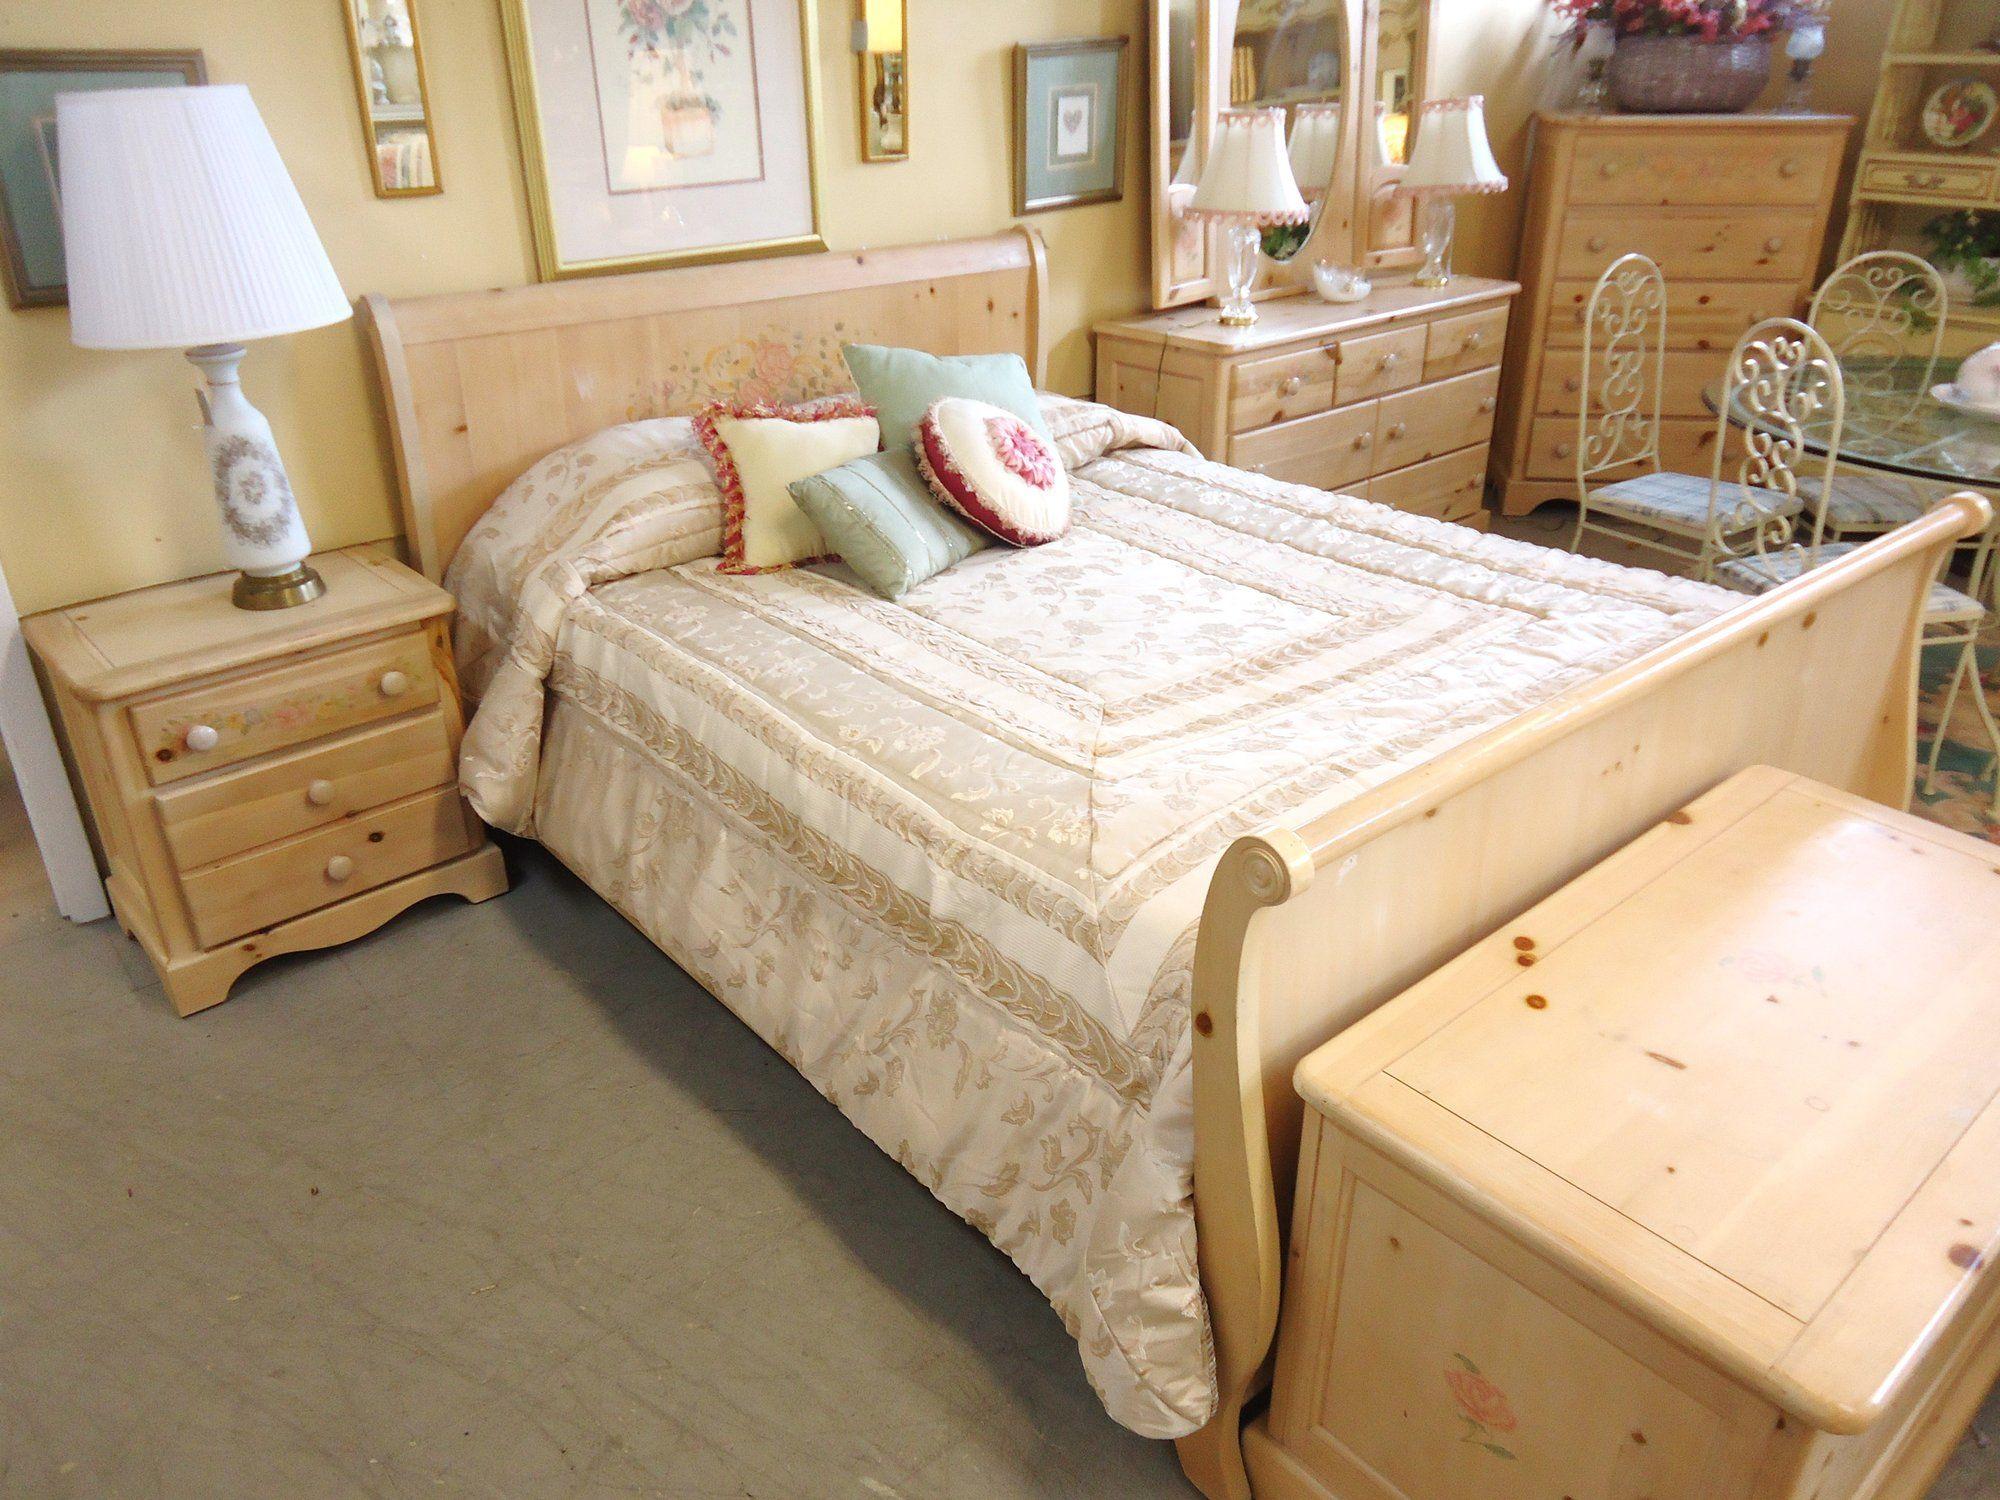 vaughan+farmhouse+cedar+oak+bedroom+furniture   15832 Vaughan ...